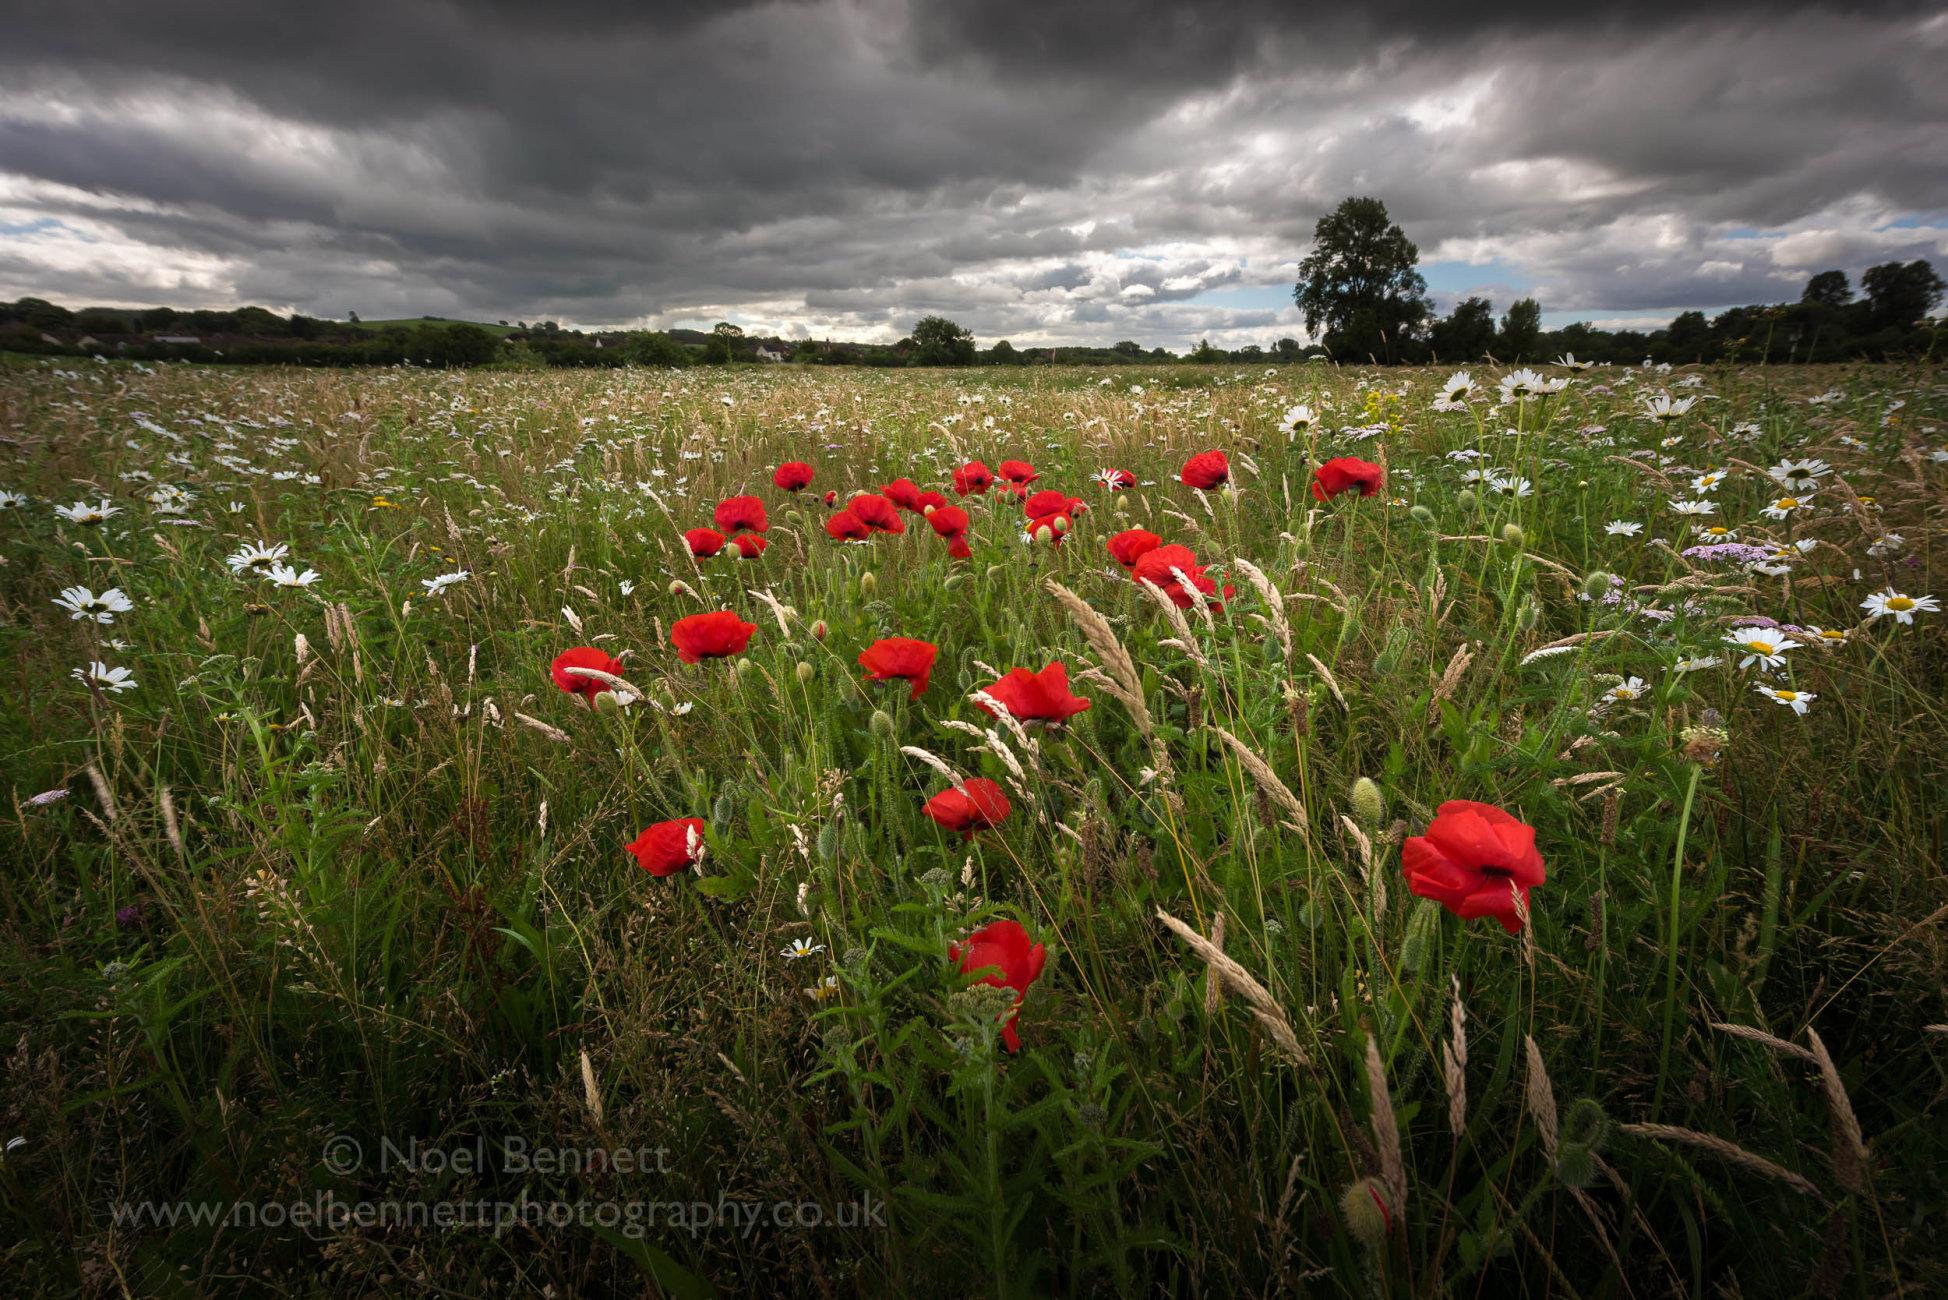 Bright Poppies Under Heavy Skies